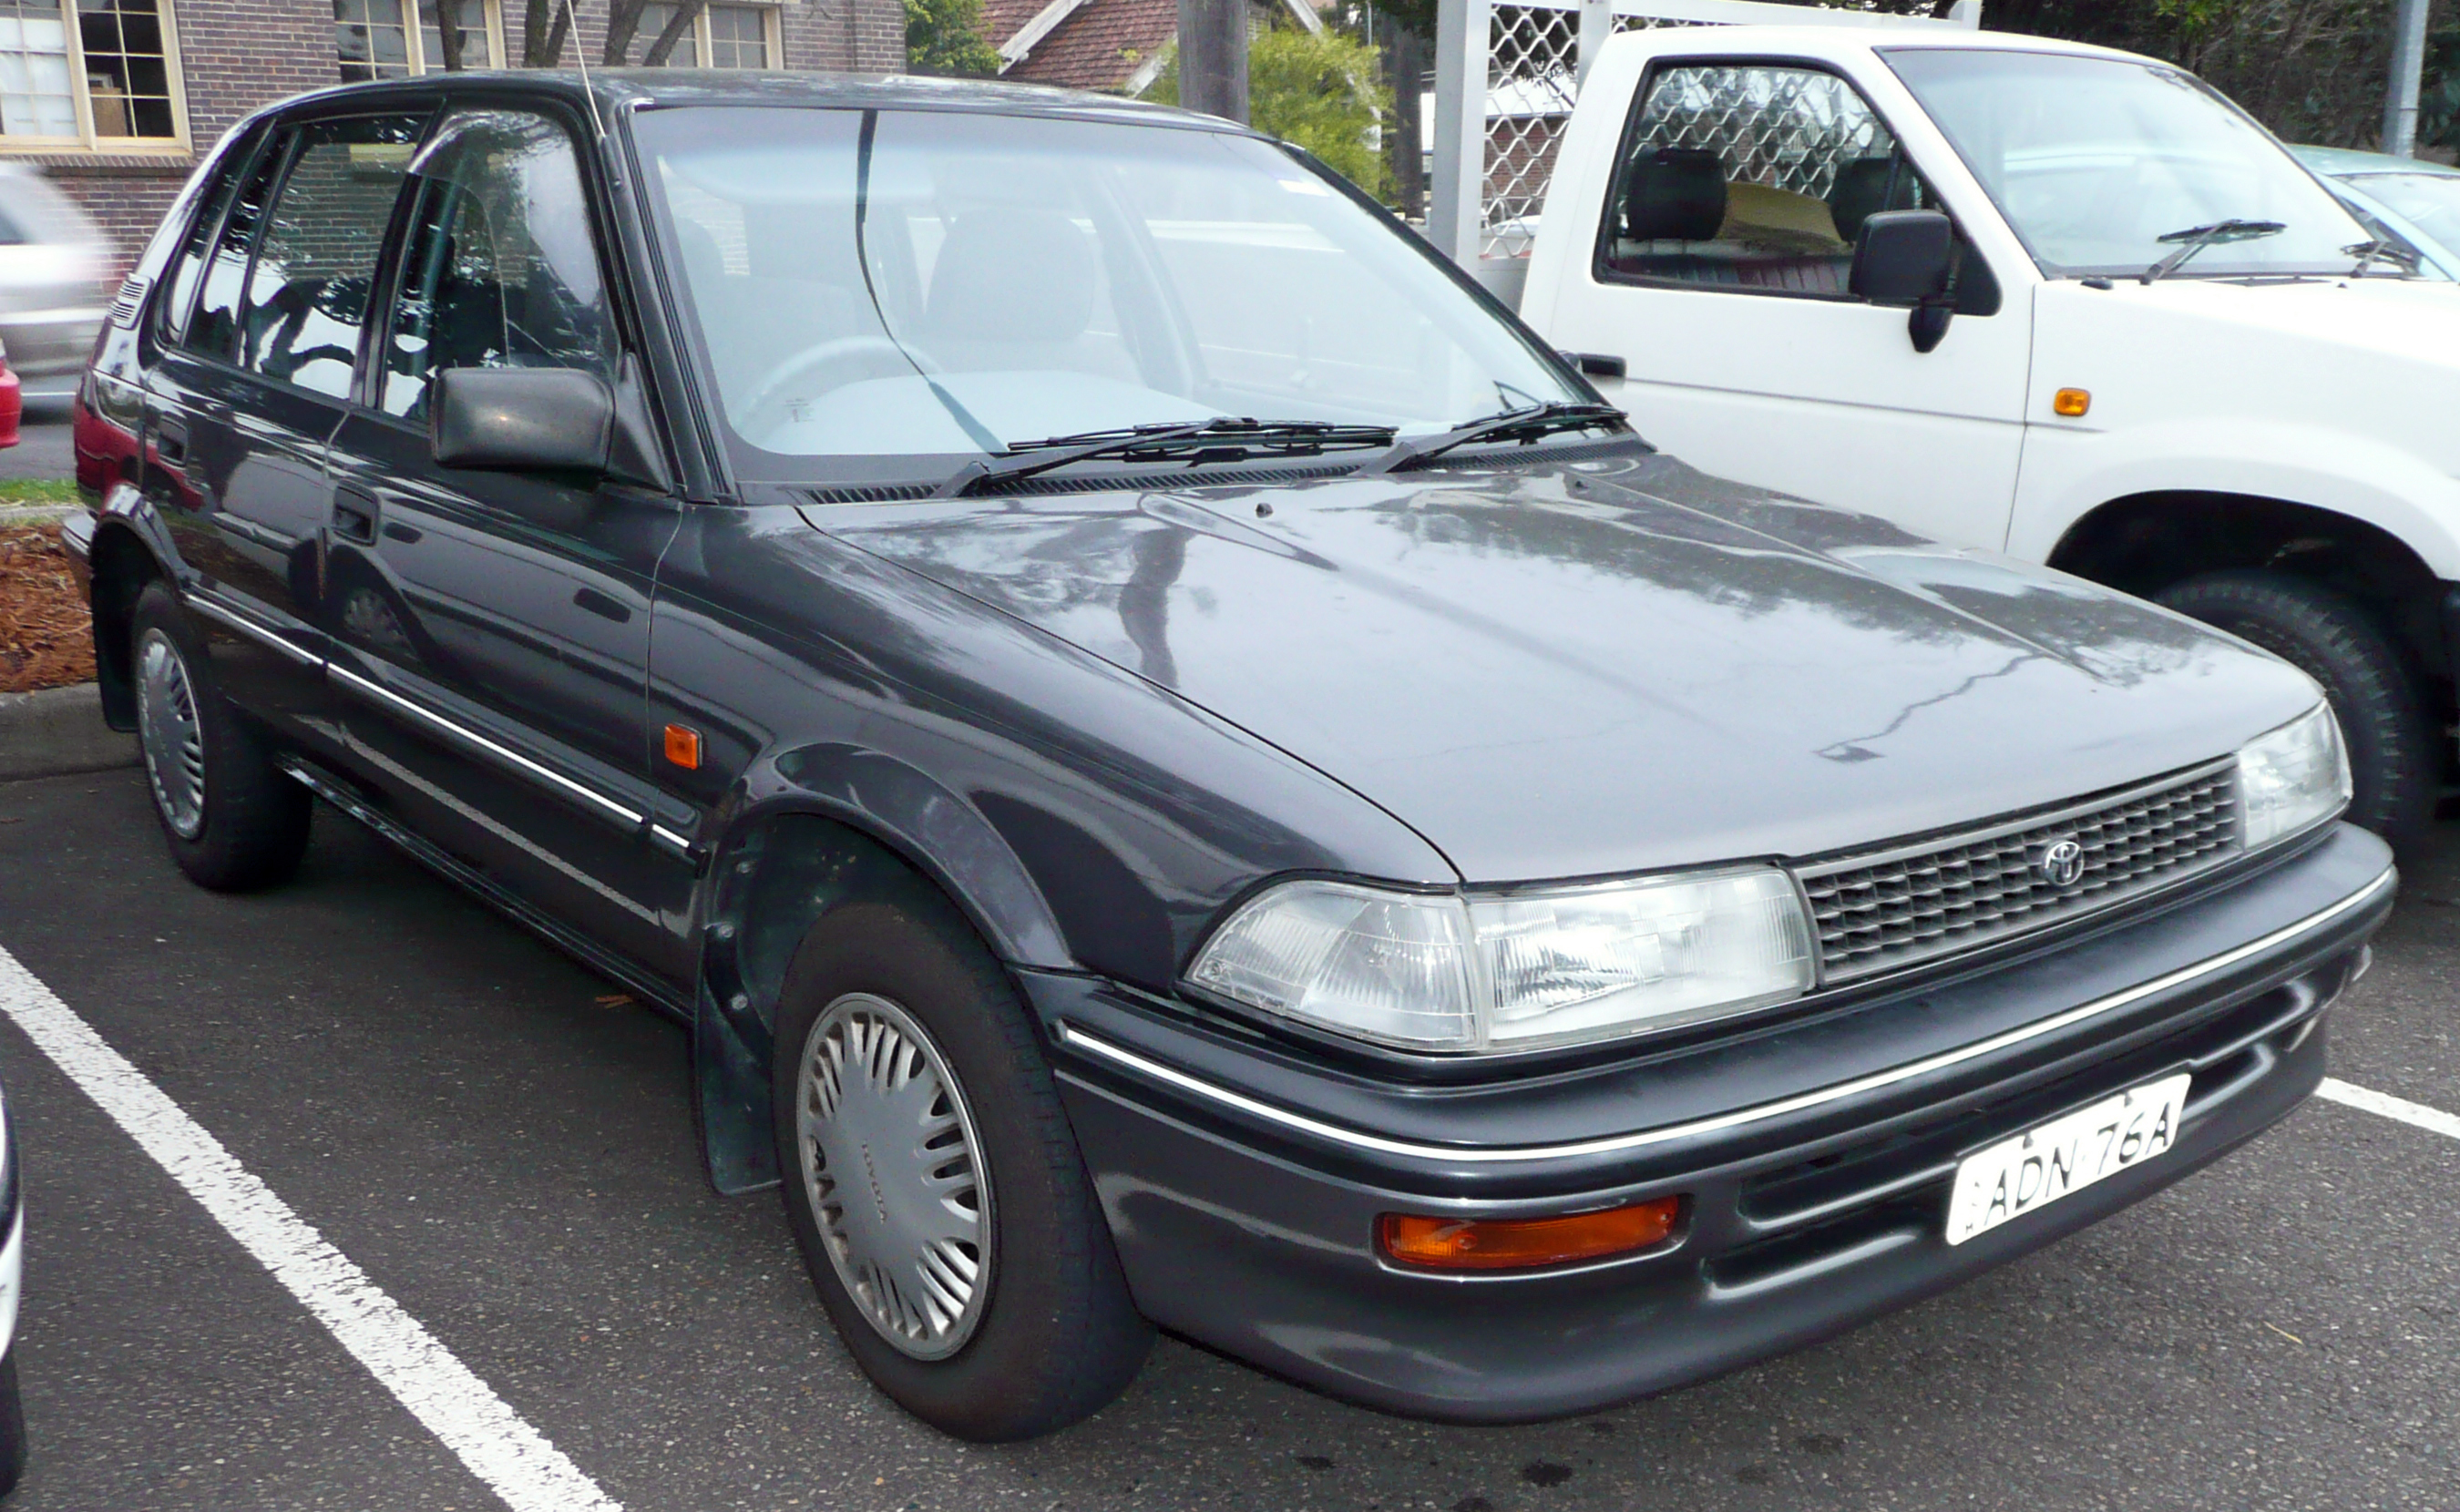 File:1991-1992 Toyota Corolla (AE94) CSi 5-door hatchback ...